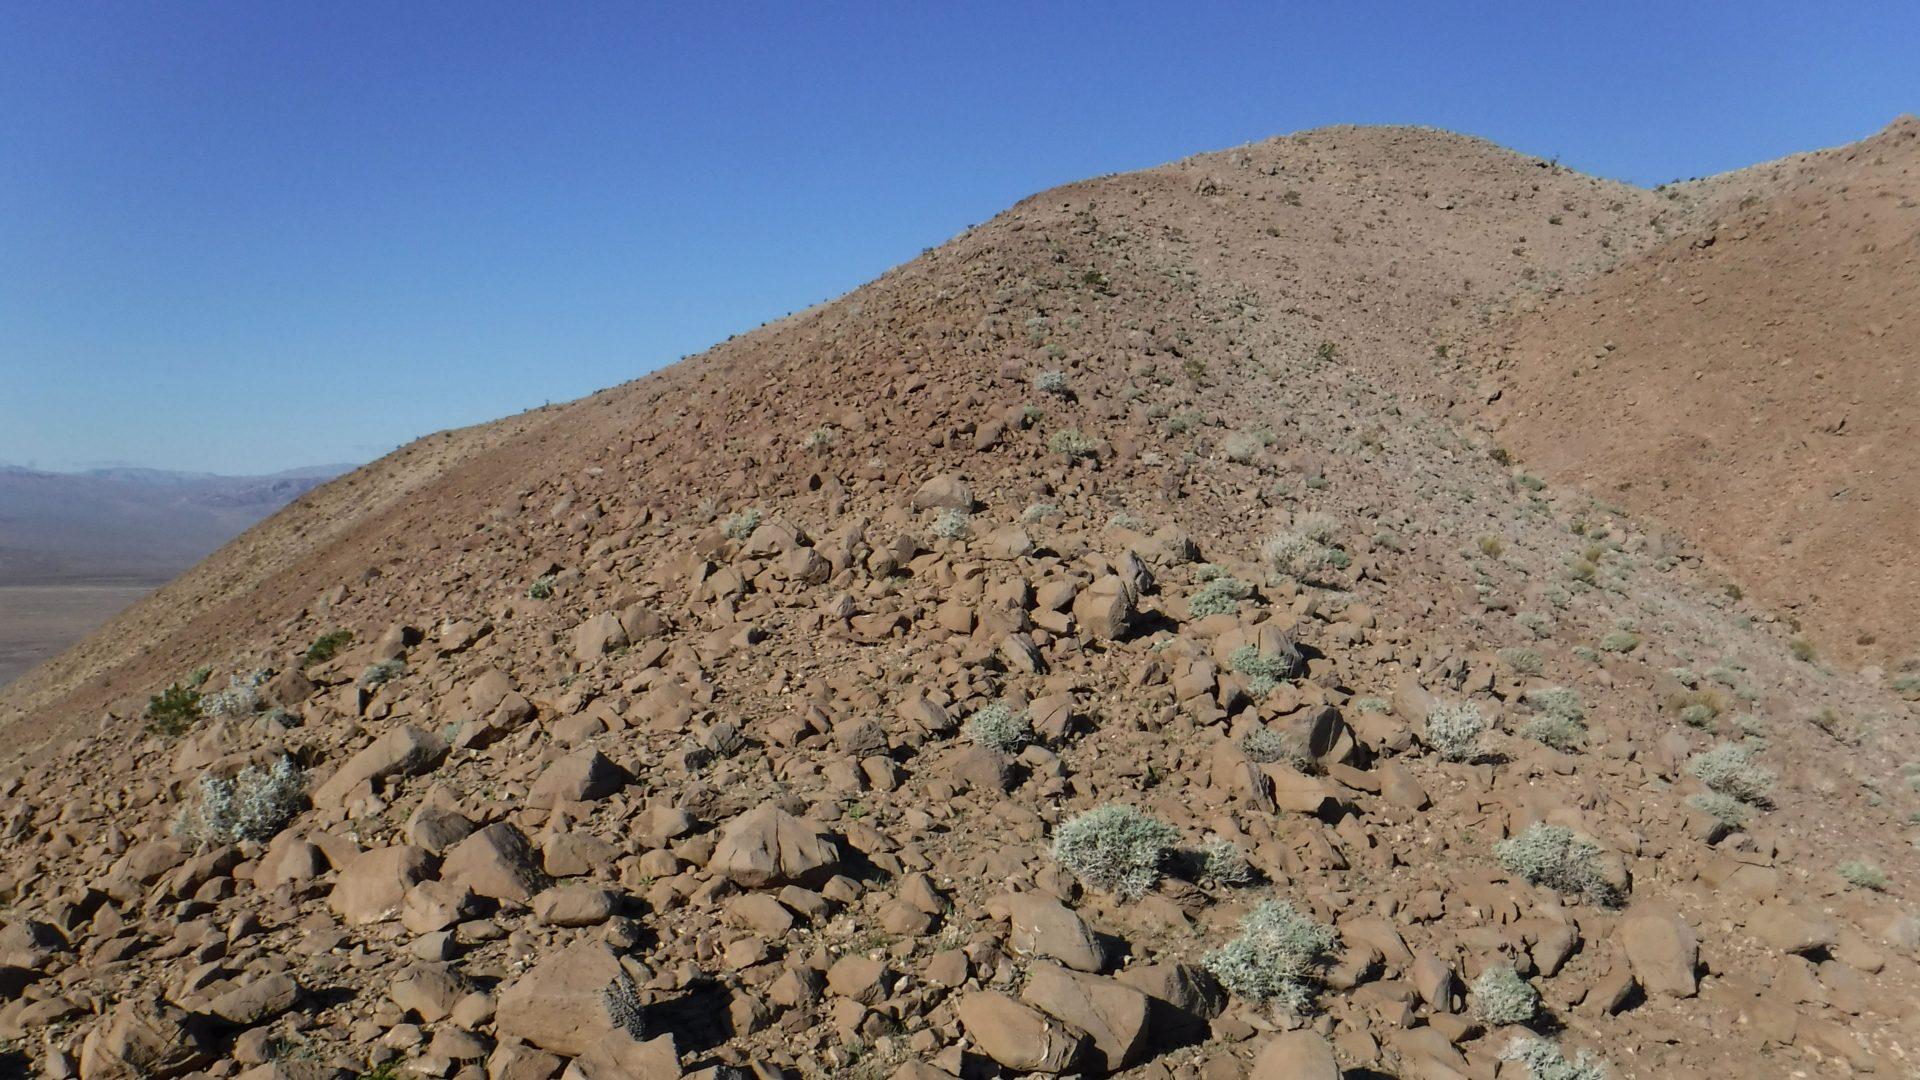 Ridgeline approaching the top of a peak